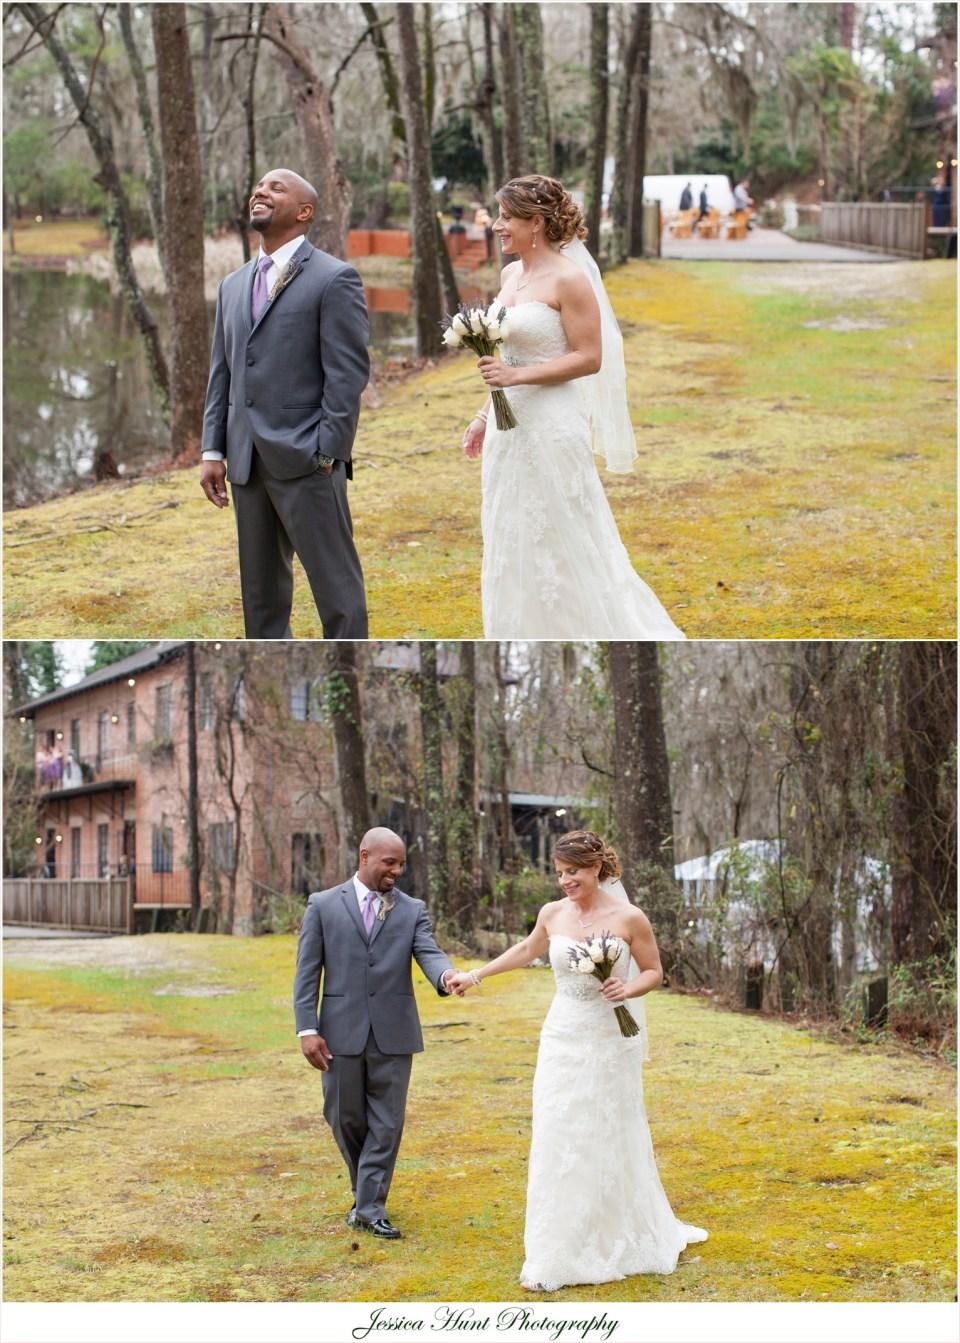 MillstoneatAdamsPond|JessicaHuntPhotography|SCWeddingPhotography|WeddingDay|2105|BLOG-42